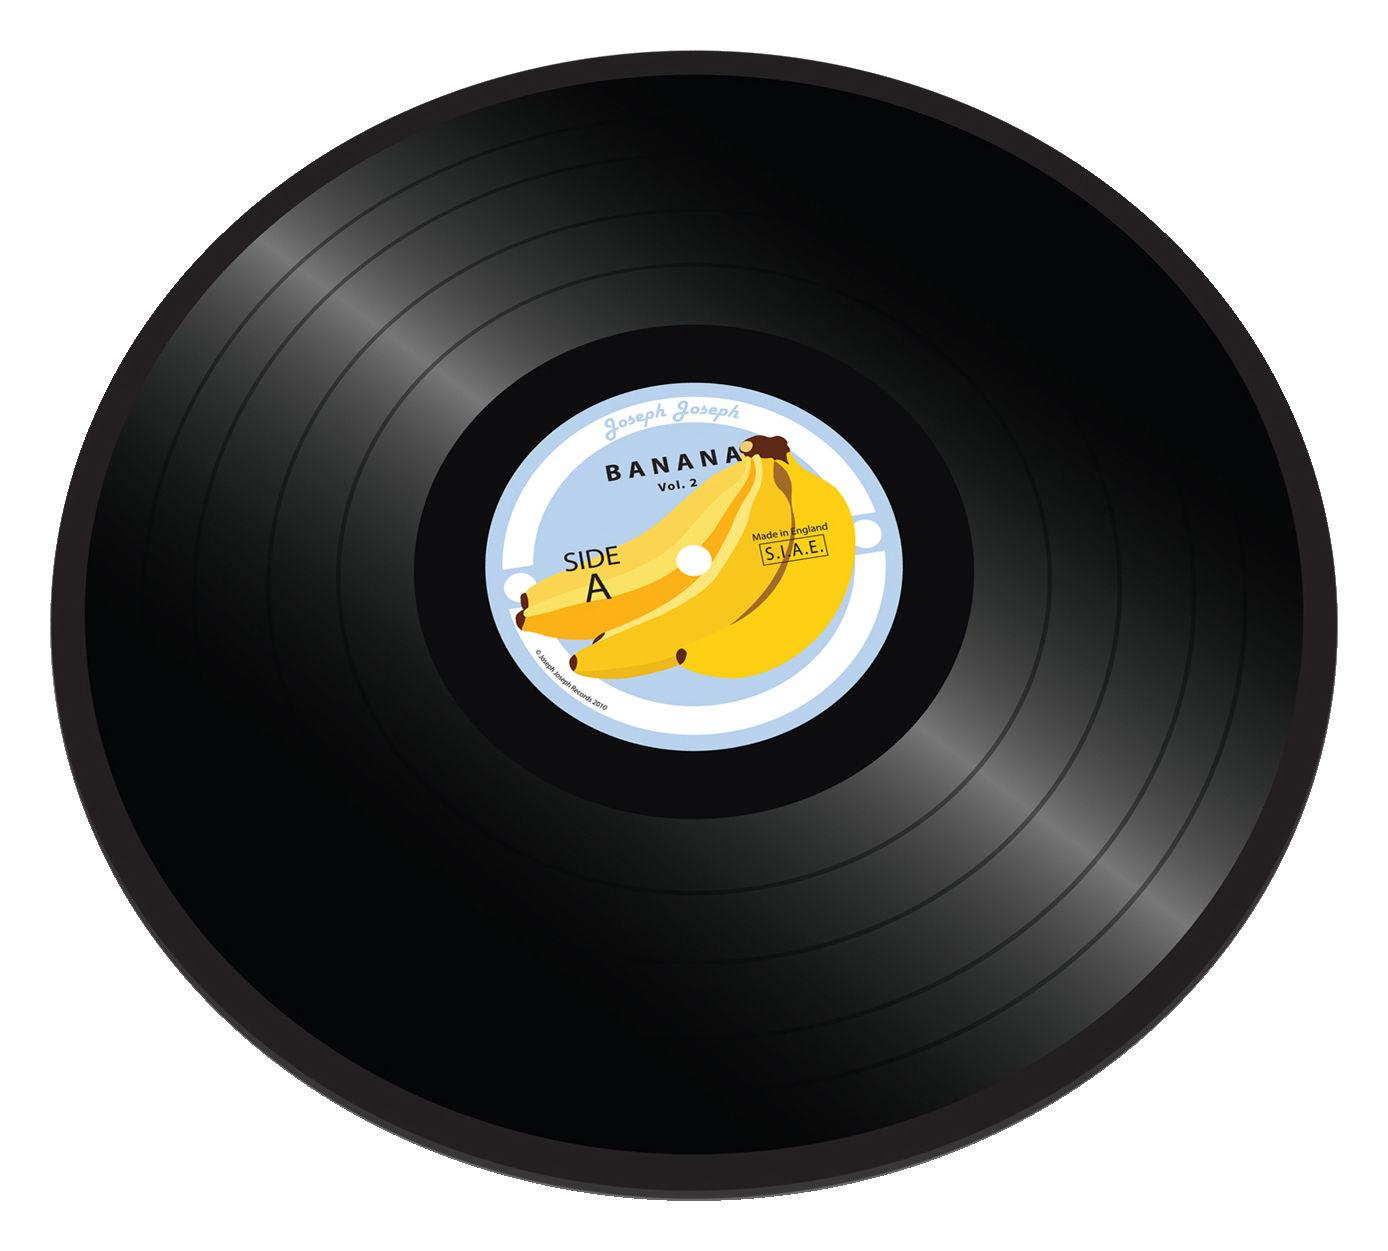 Tableware - Trays - Banana vinyl Chopping board by Joseph Joseph - Banana Vinyl design - Glass